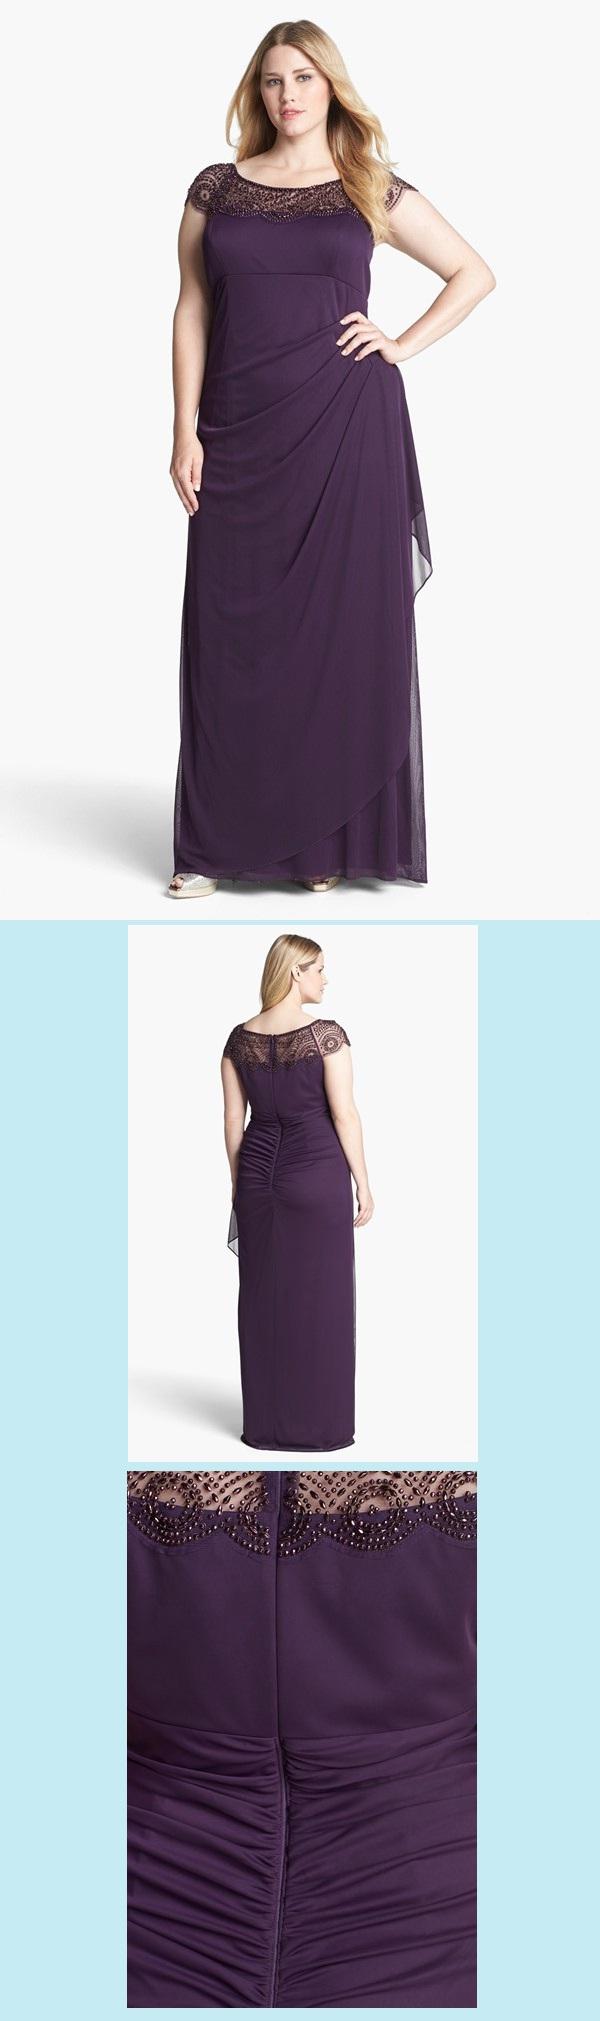 Nordstrom Rack. Xscape. Beaded Yoke Mesh Gown (Plus Size). | Plus ...